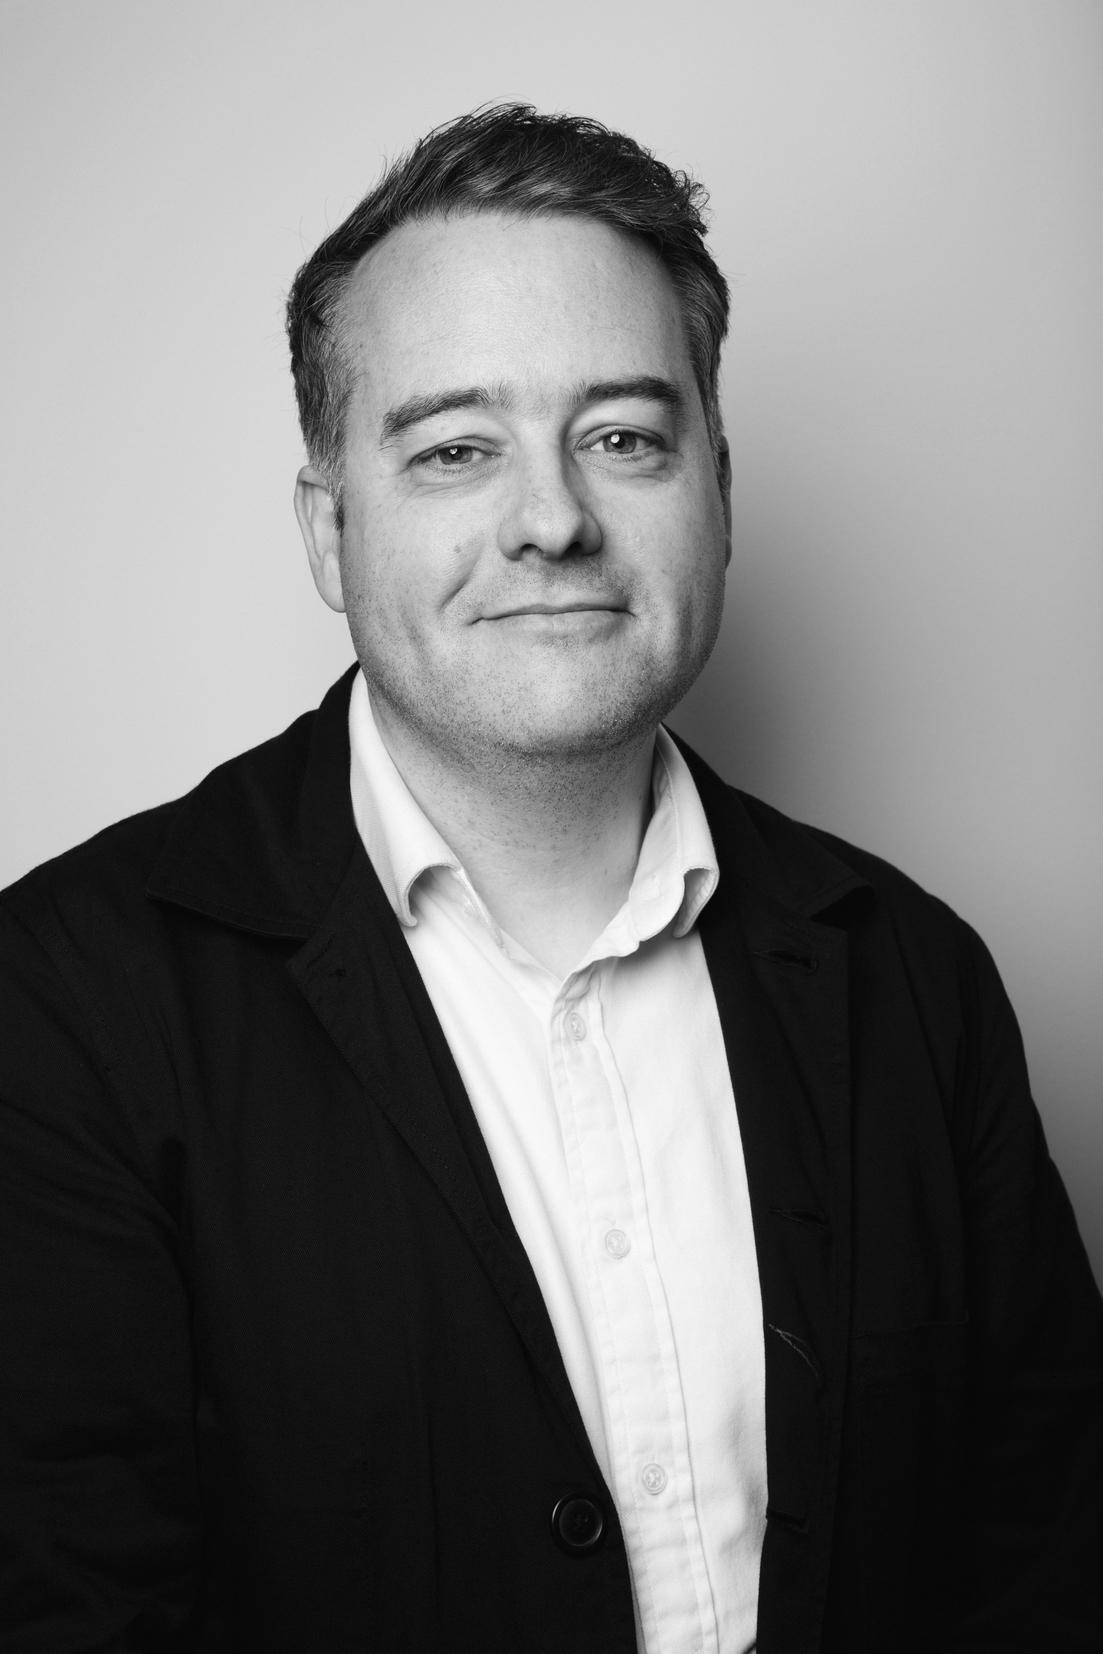 Declan McCafferty